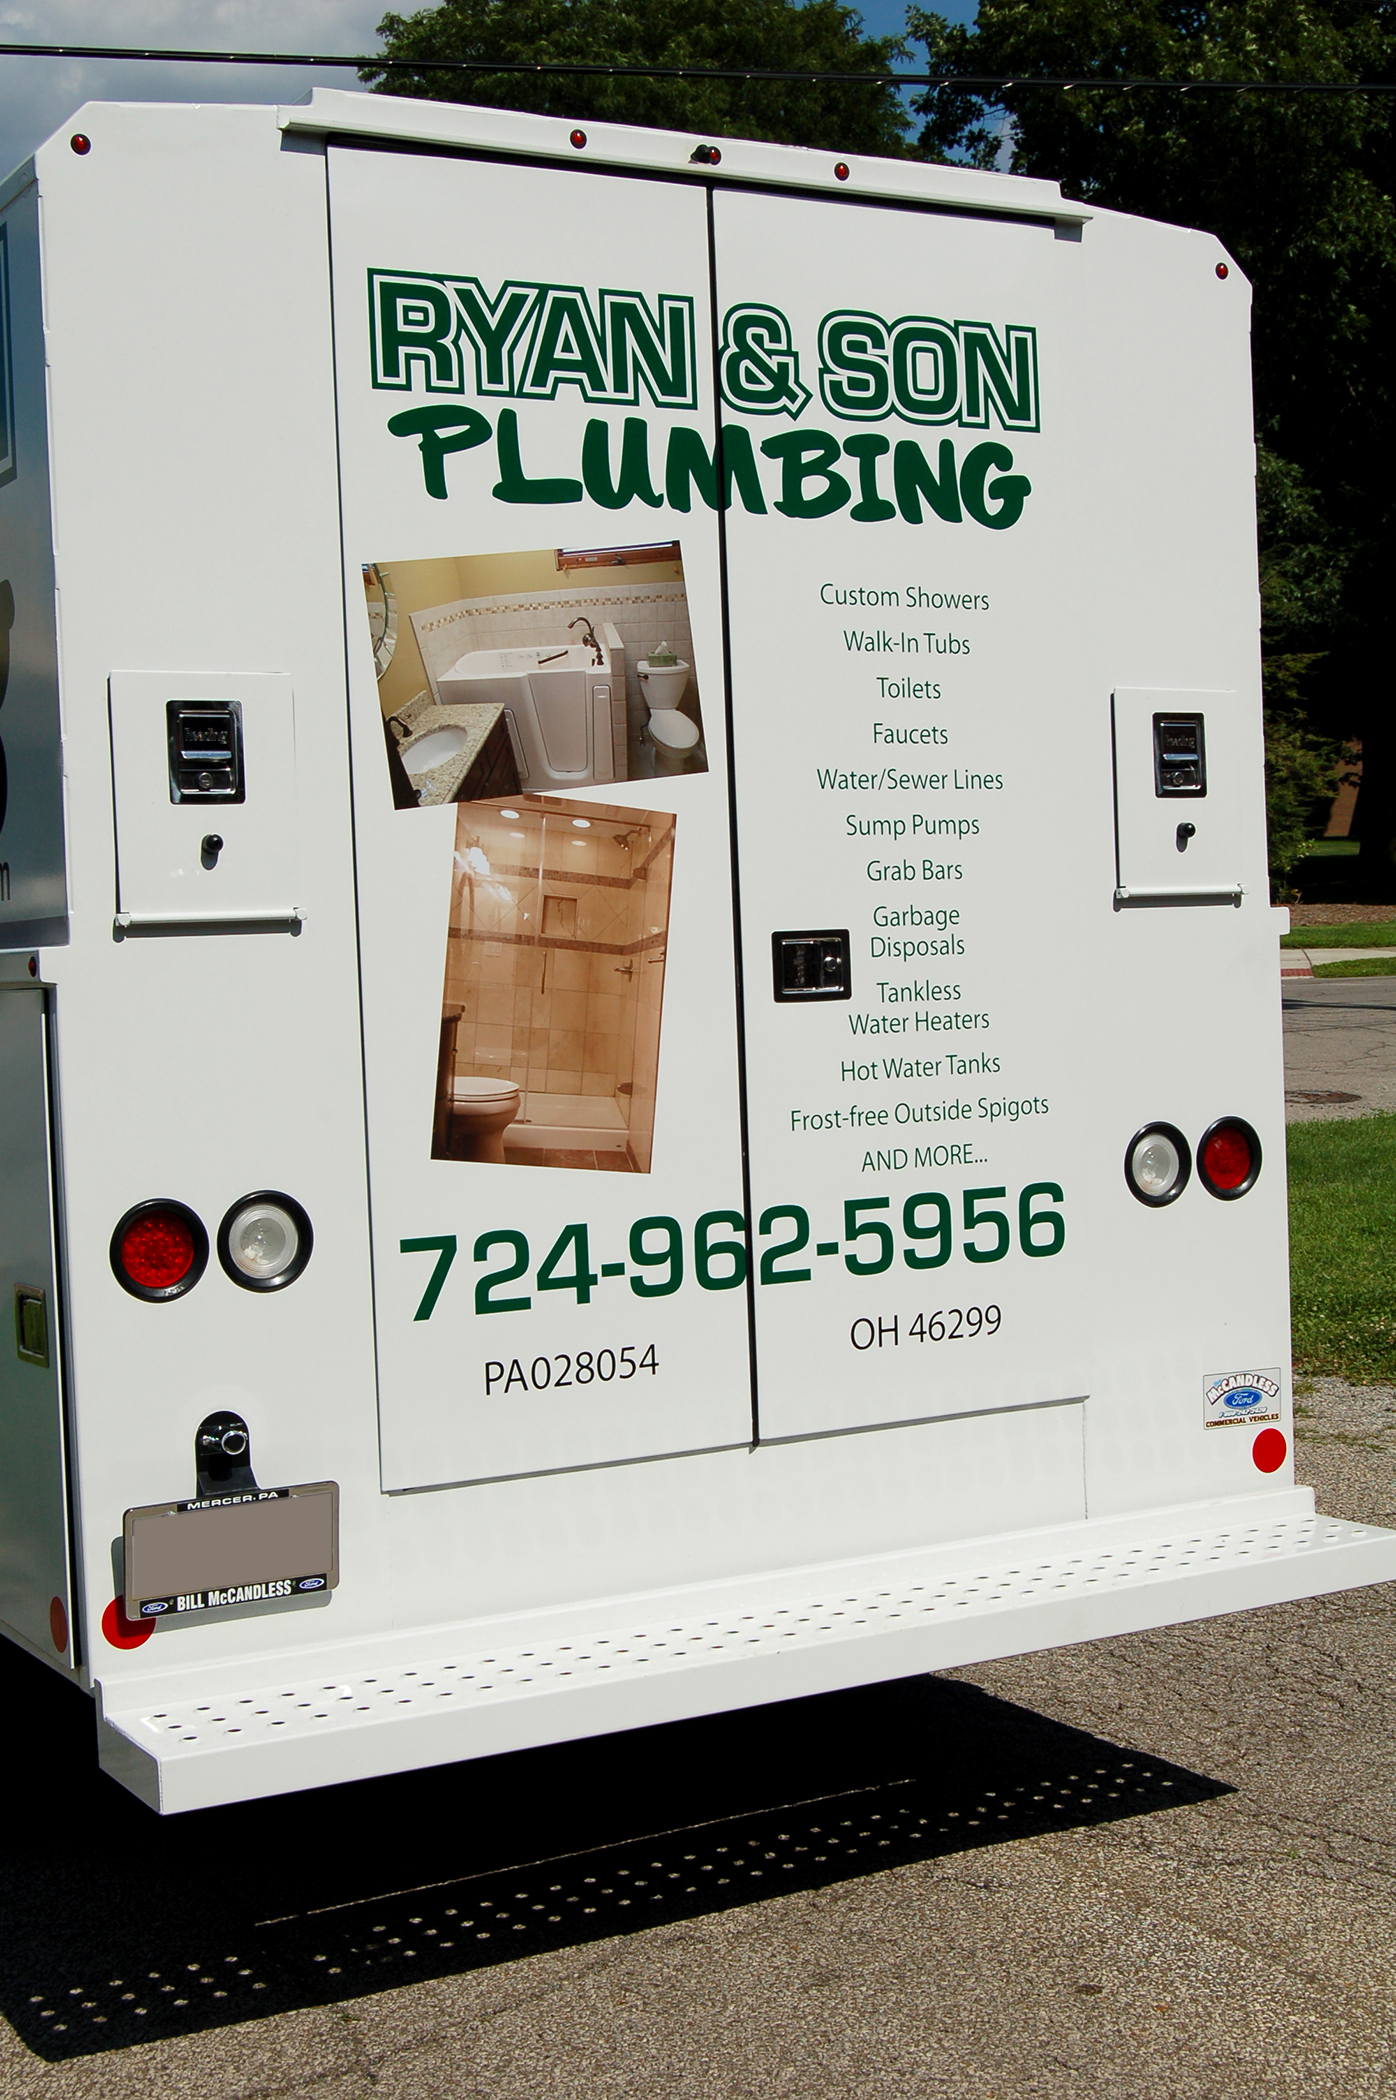 Client: Ryan & Son Plumbing